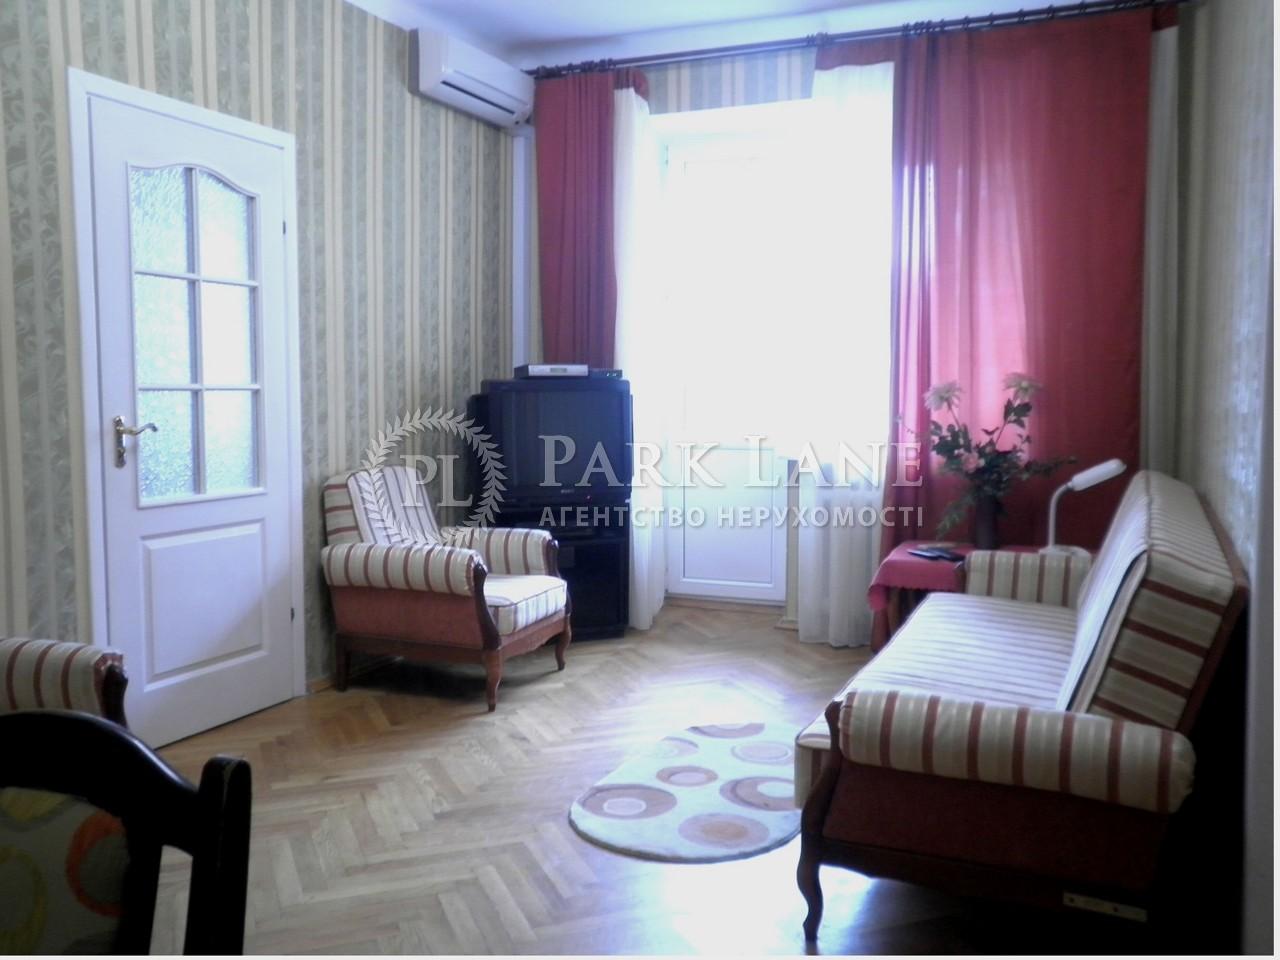 Квартира ул. Бассейная, 10, Киев, F-5893 - Фото 3